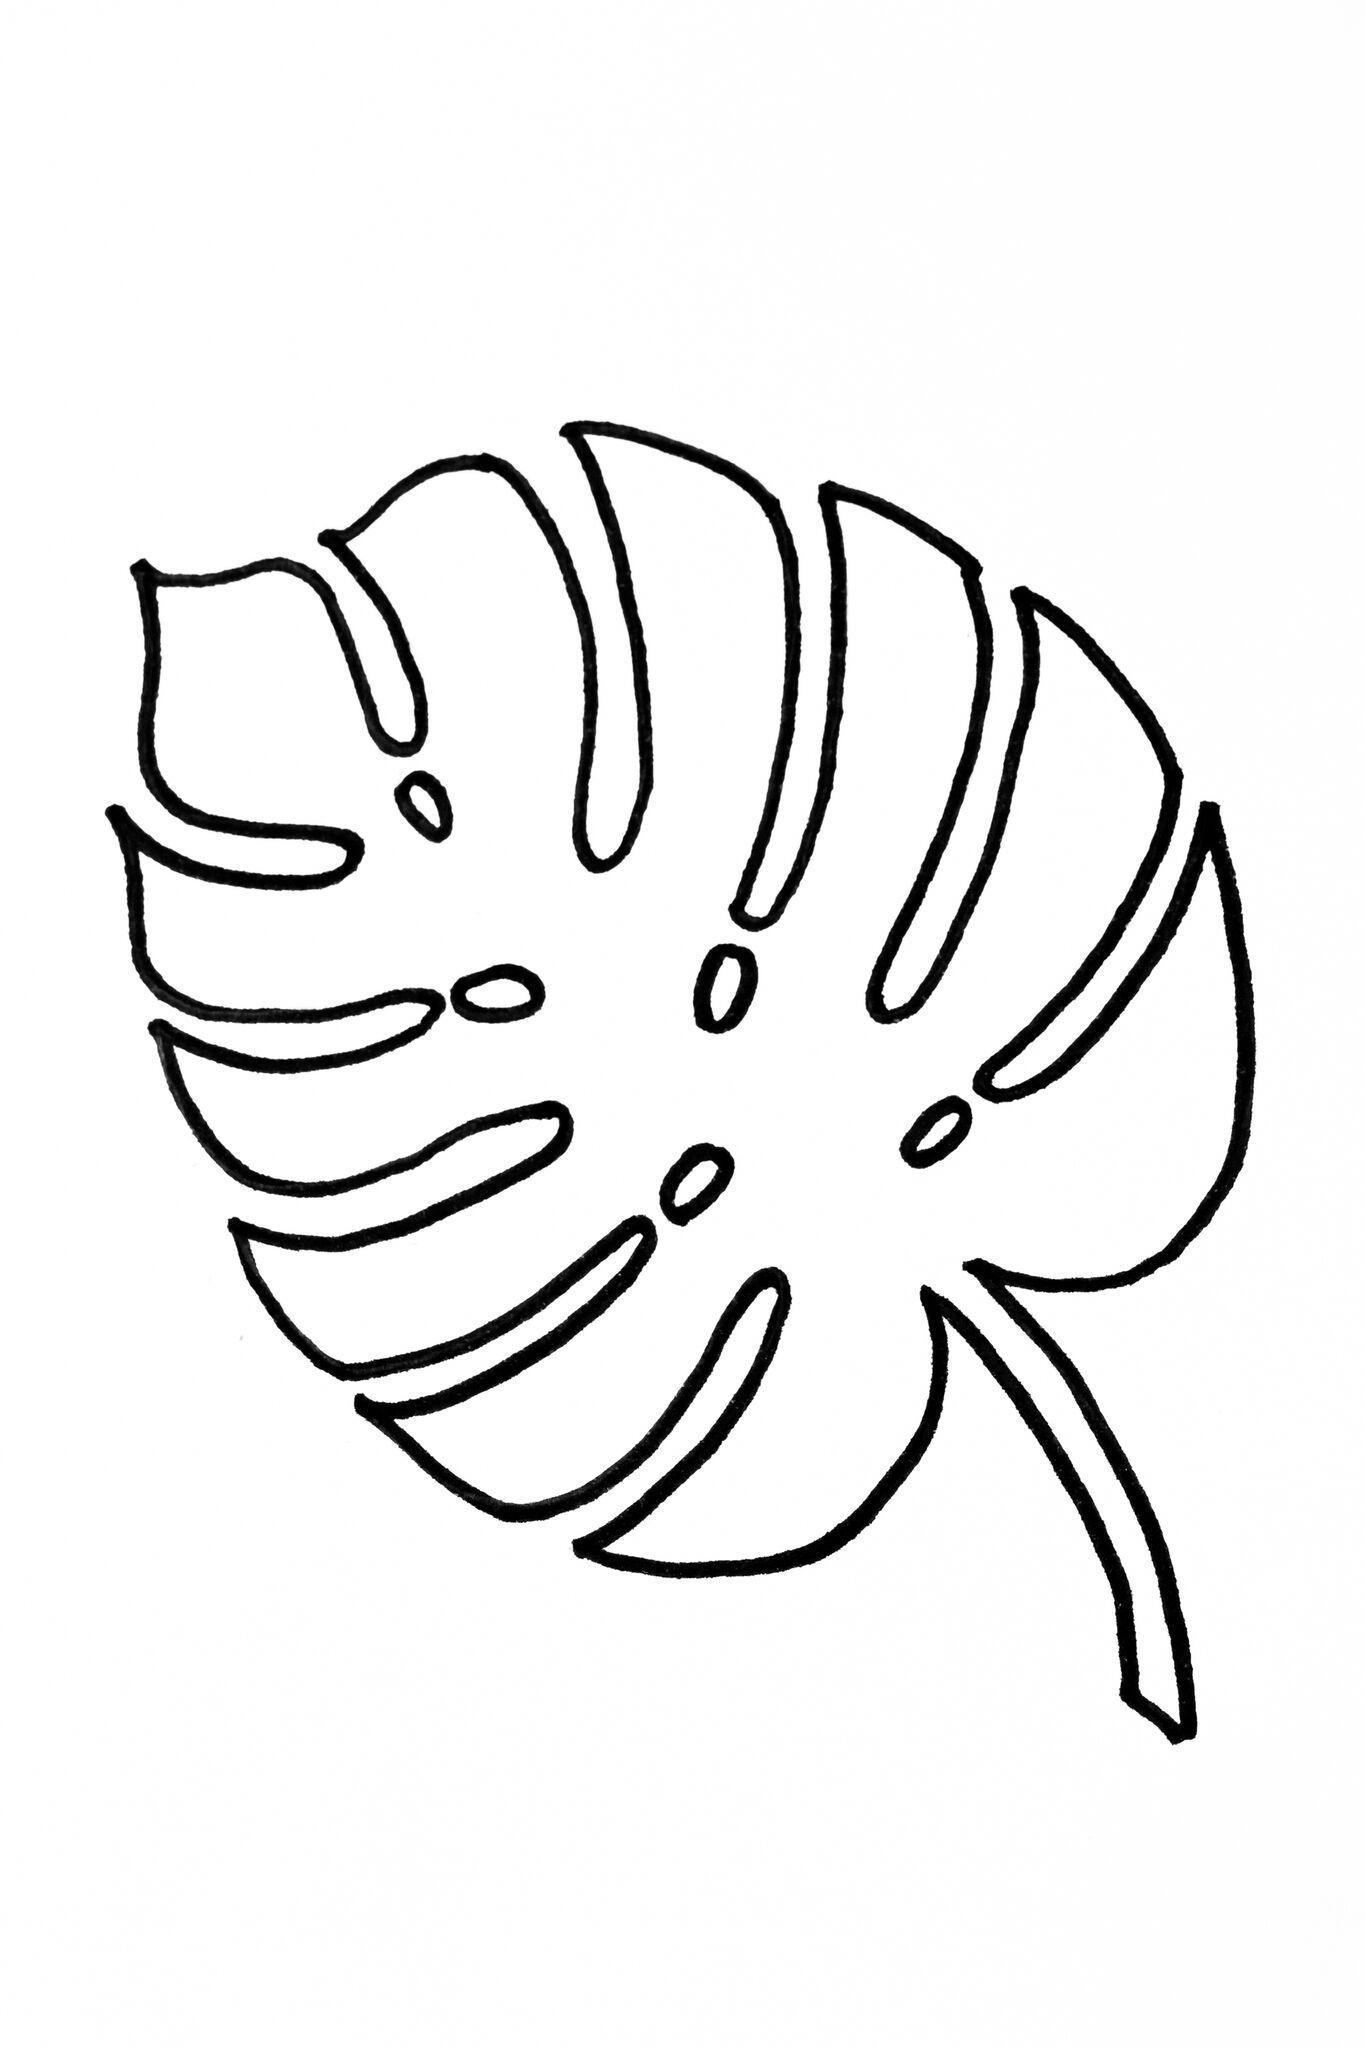 002 Striking Leaf Template With Line Idea  Fall Printable BlankFull